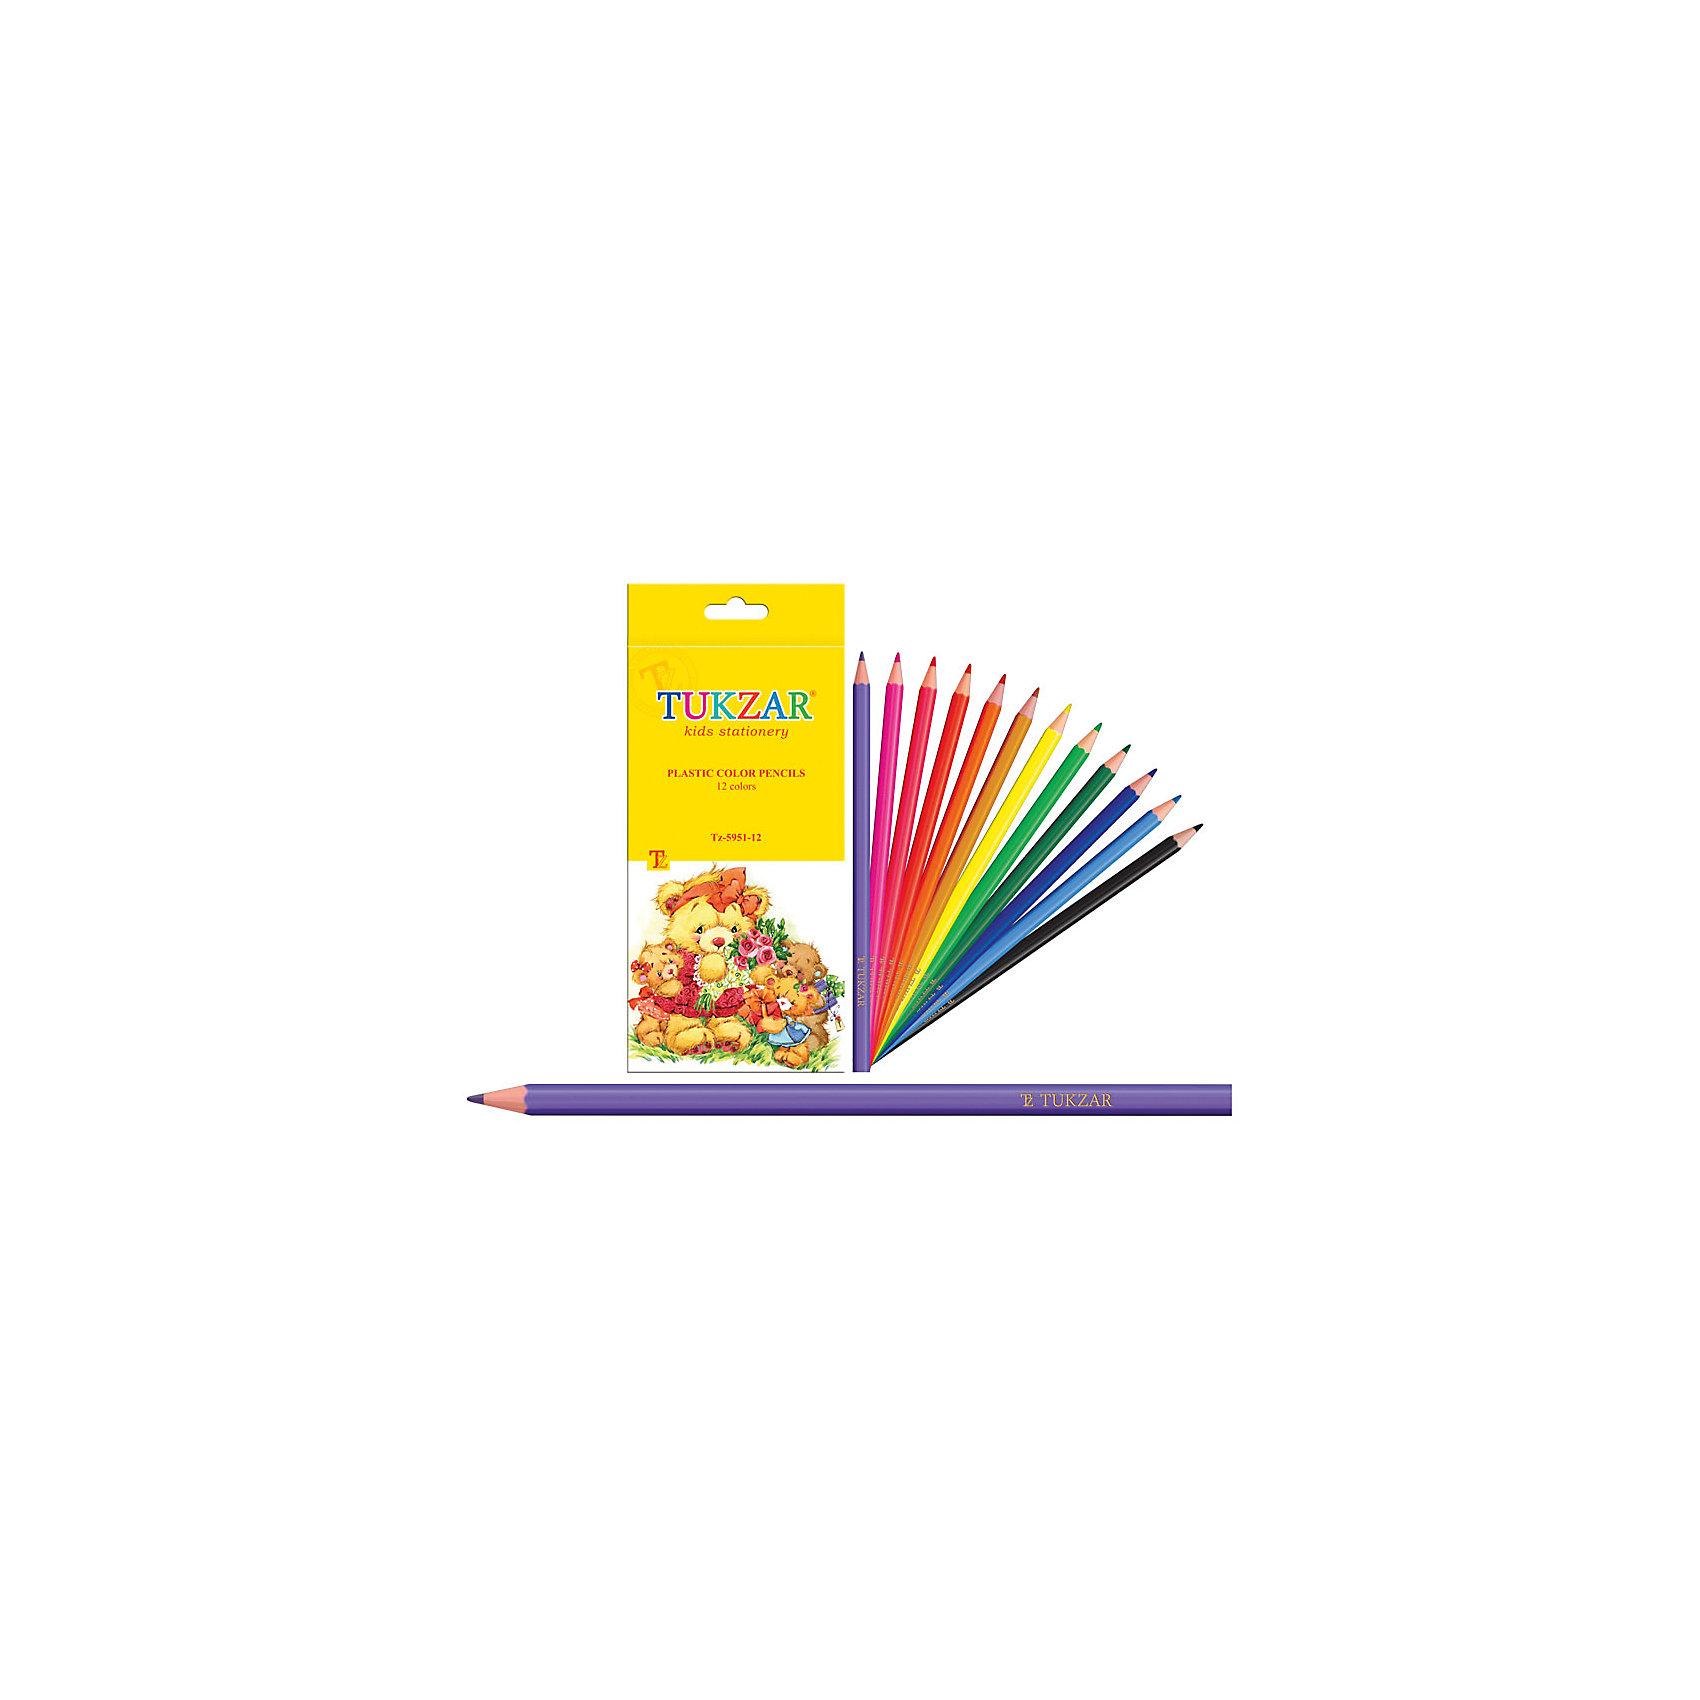 Цветные карандаши, 12 цветовКарандаши цветные пластиковые 12 цветов<br><br>Ширина мм: 150<br>Глубина мм: 10<br>Высота мм: 100<br>Вес г: 40<br>Возраст от месяцев: 36<br>Возраст до месяцев: 120<br>Пол: Унисекс<br>Возраст: Детский<br>SKU: 4633099